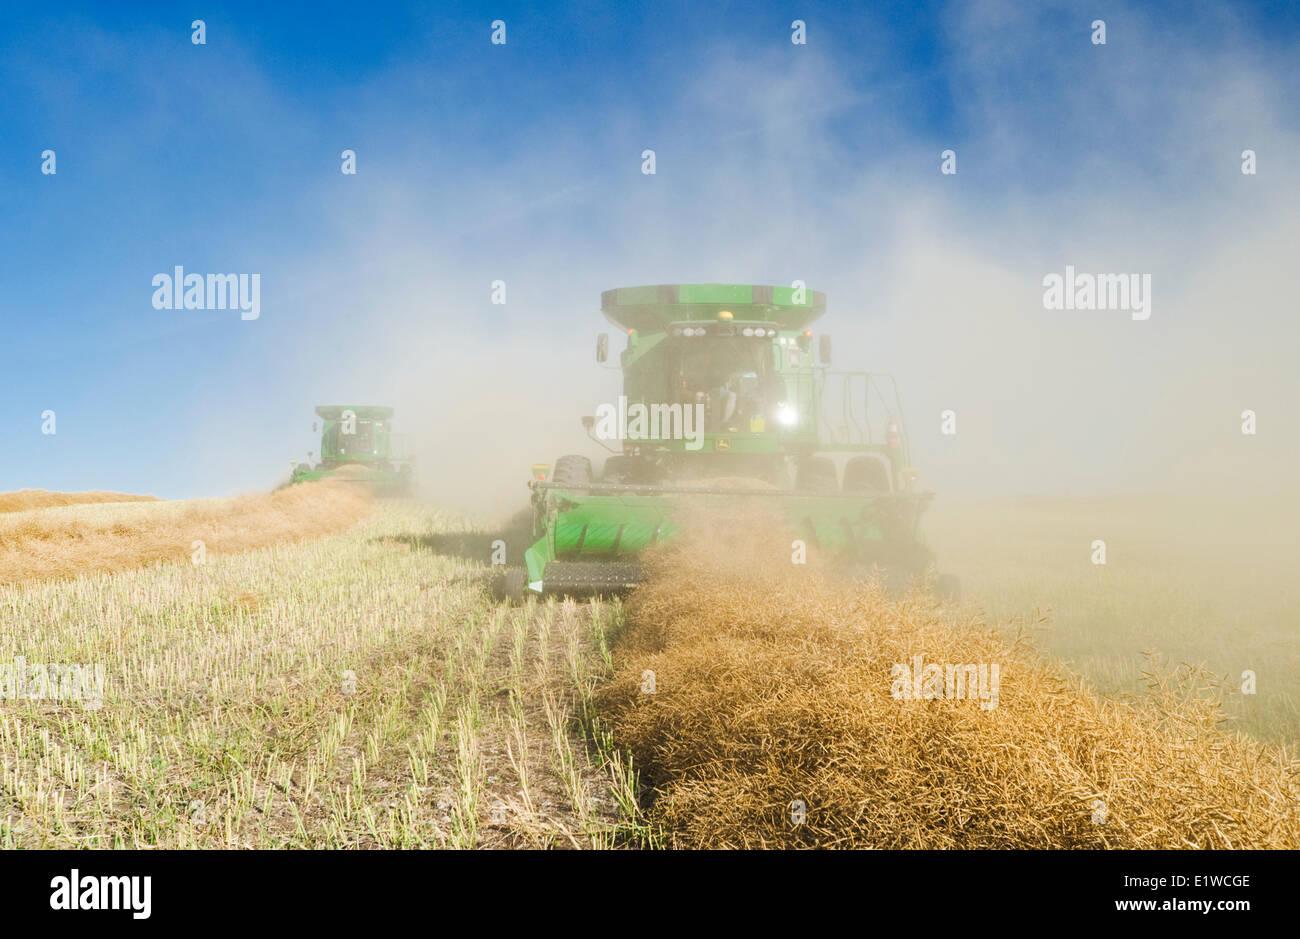 combine harvesters work in a swathed canola field, near Kamsack, Saskatchewan, Canada - Stock Image